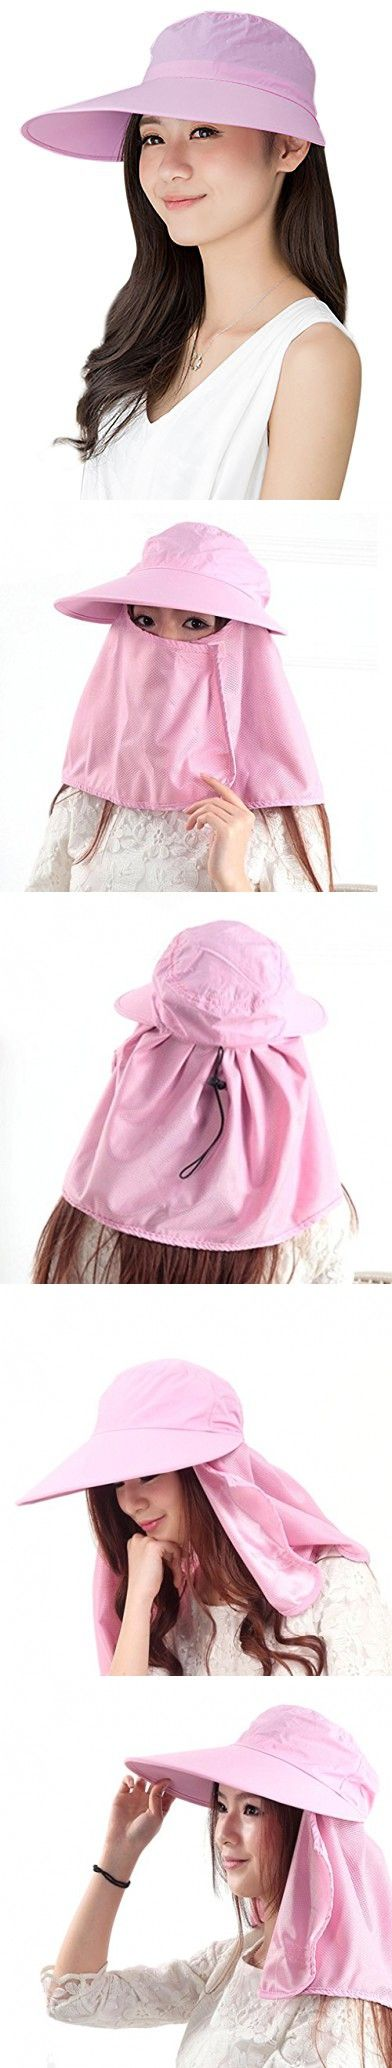 Women Summer Cotton Large Wide Brim Anti-uv Face Cover Sun Visor Hat Cap